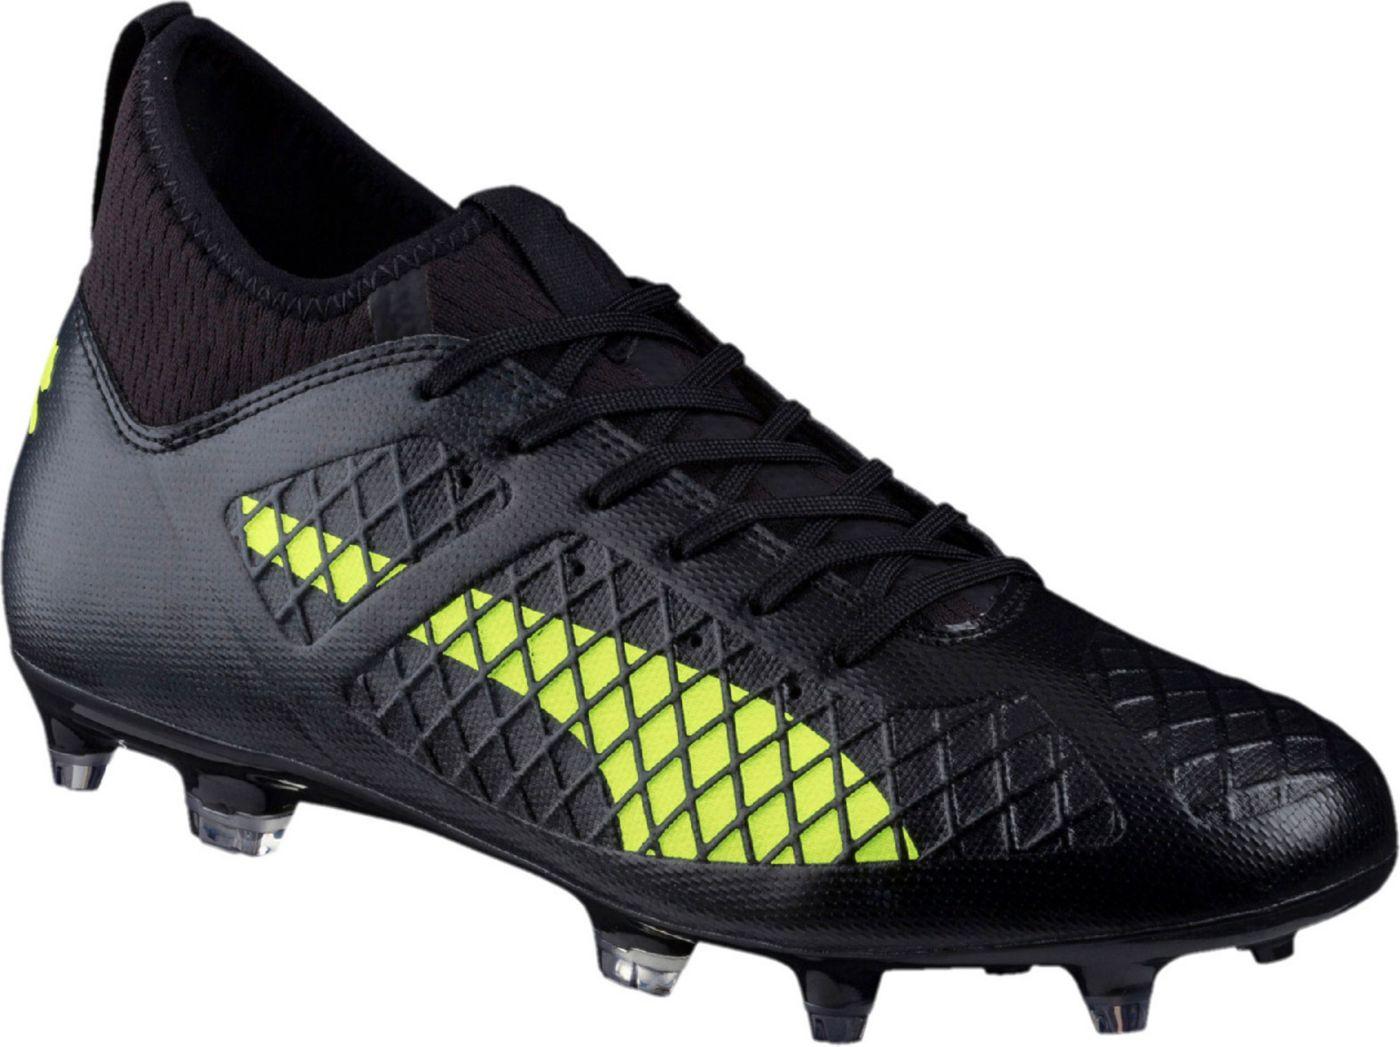 PUMA Men's Future 18.3 FG/AG Soccer Cleats